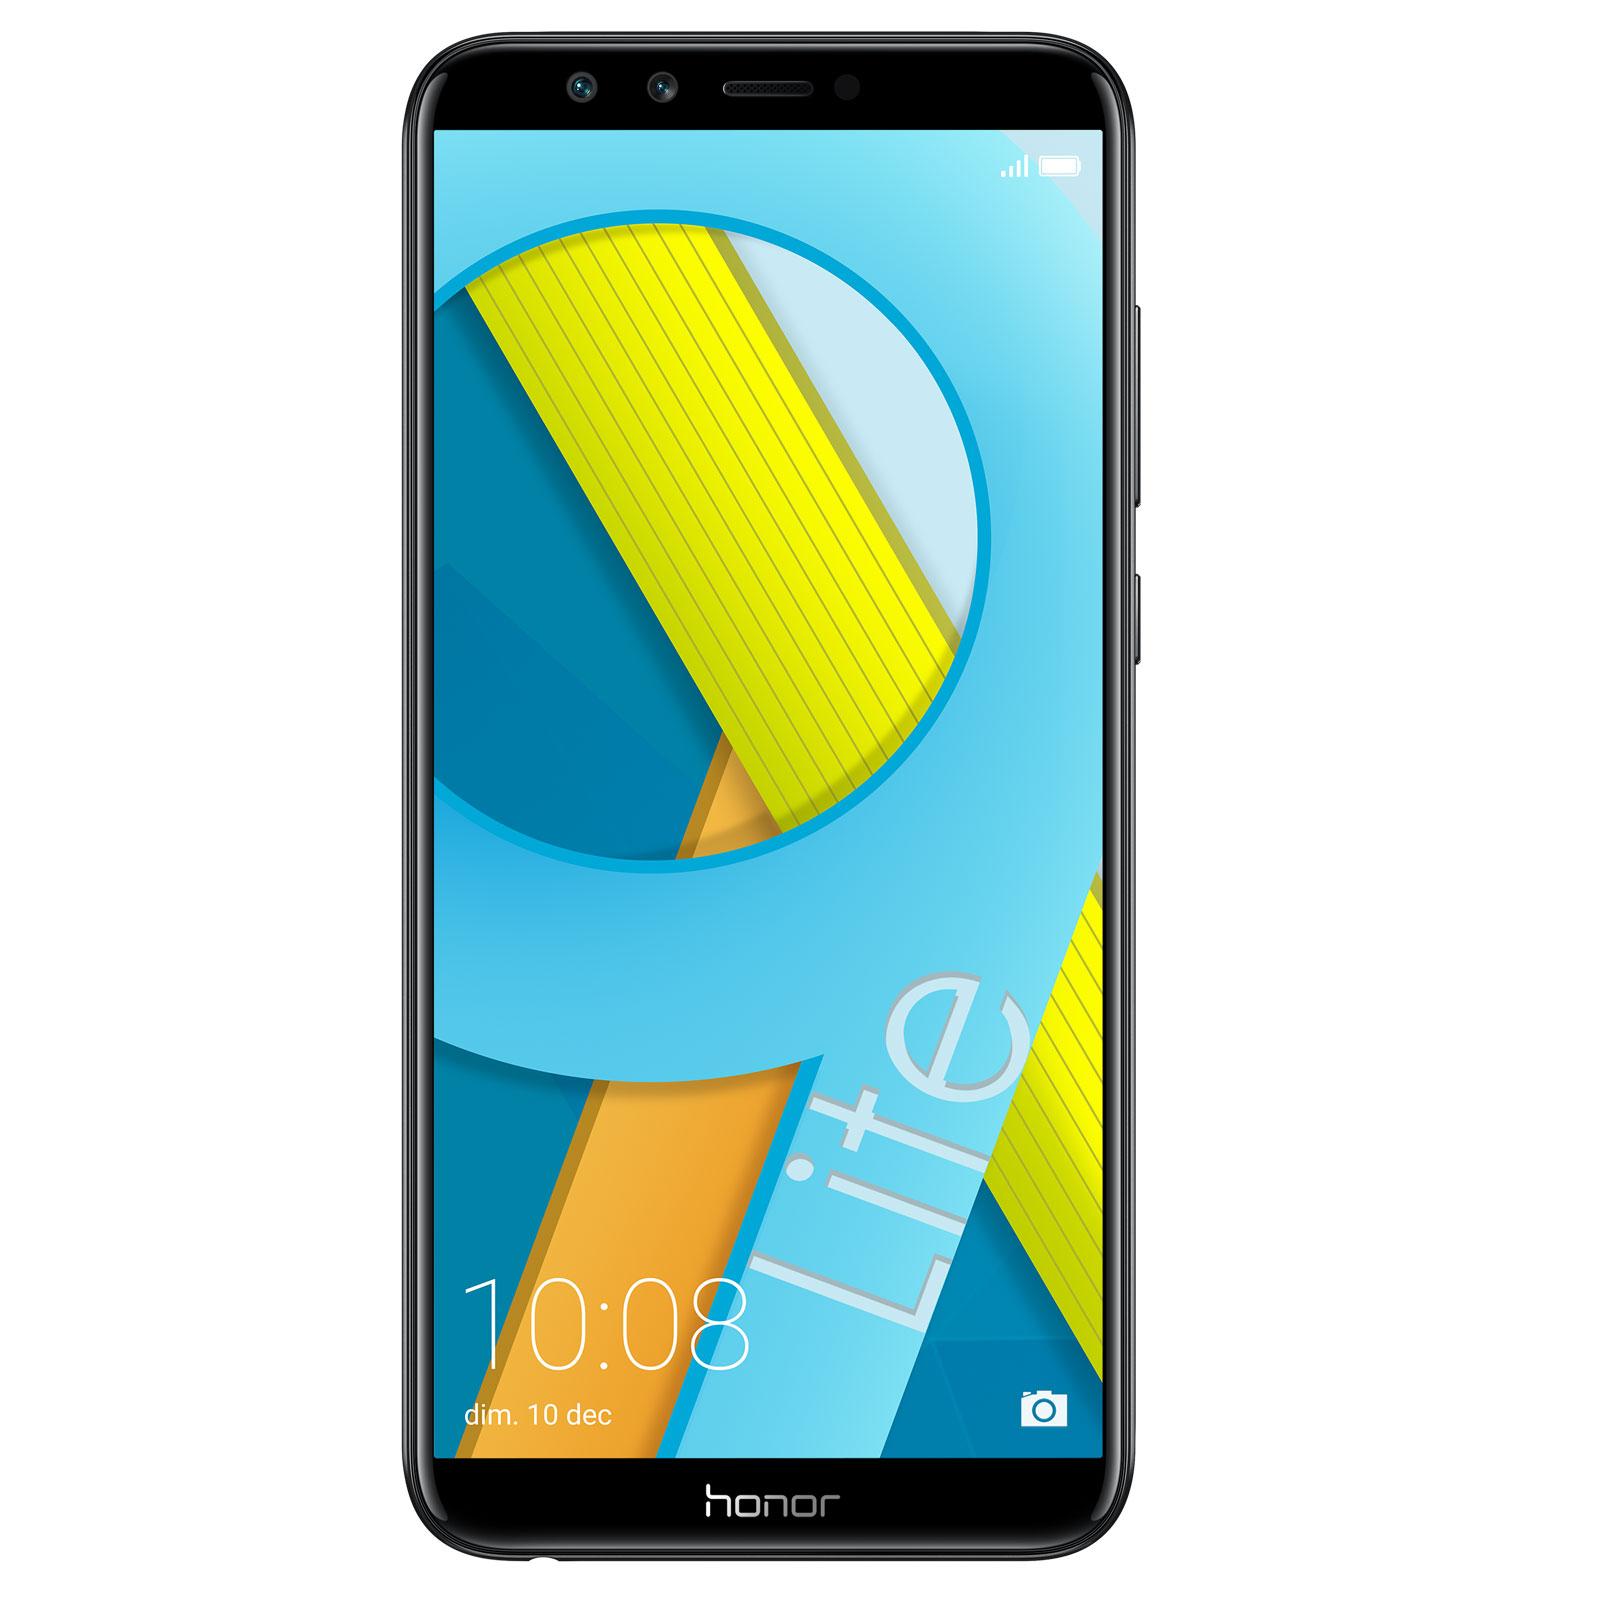 "Mobile & smartphone Honor 9 Lite Noir Smartphone 4G-LTE Dual SIM - Kirin 659 8-Core 2,36 GHz - RAM 3 Go - Ecran tactile 5.65"" 1080 x 2160 - 32 Go - NFC/Bluetooth 4.2 - 3000 mAh - Android 8.0"